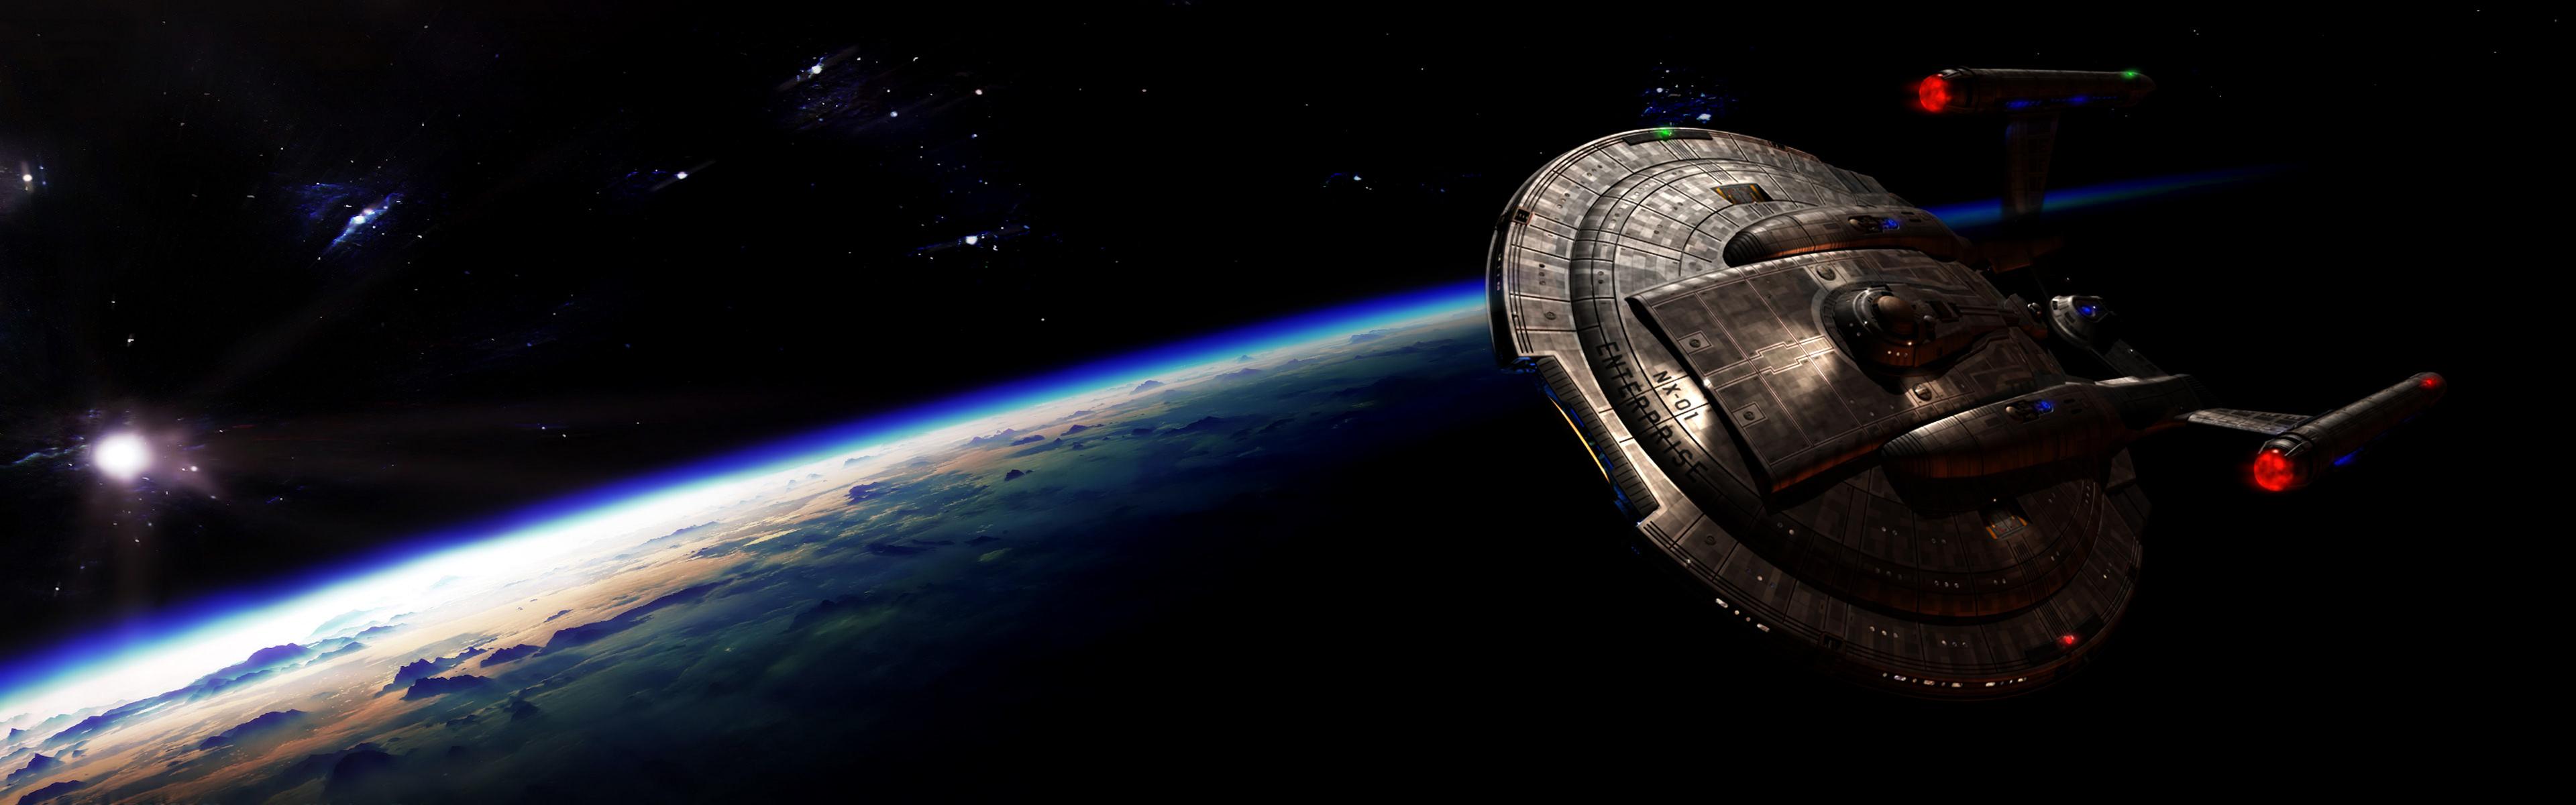 Wallpaper Abyss Explore the Collection Star Trek Sci Fi Star Trek